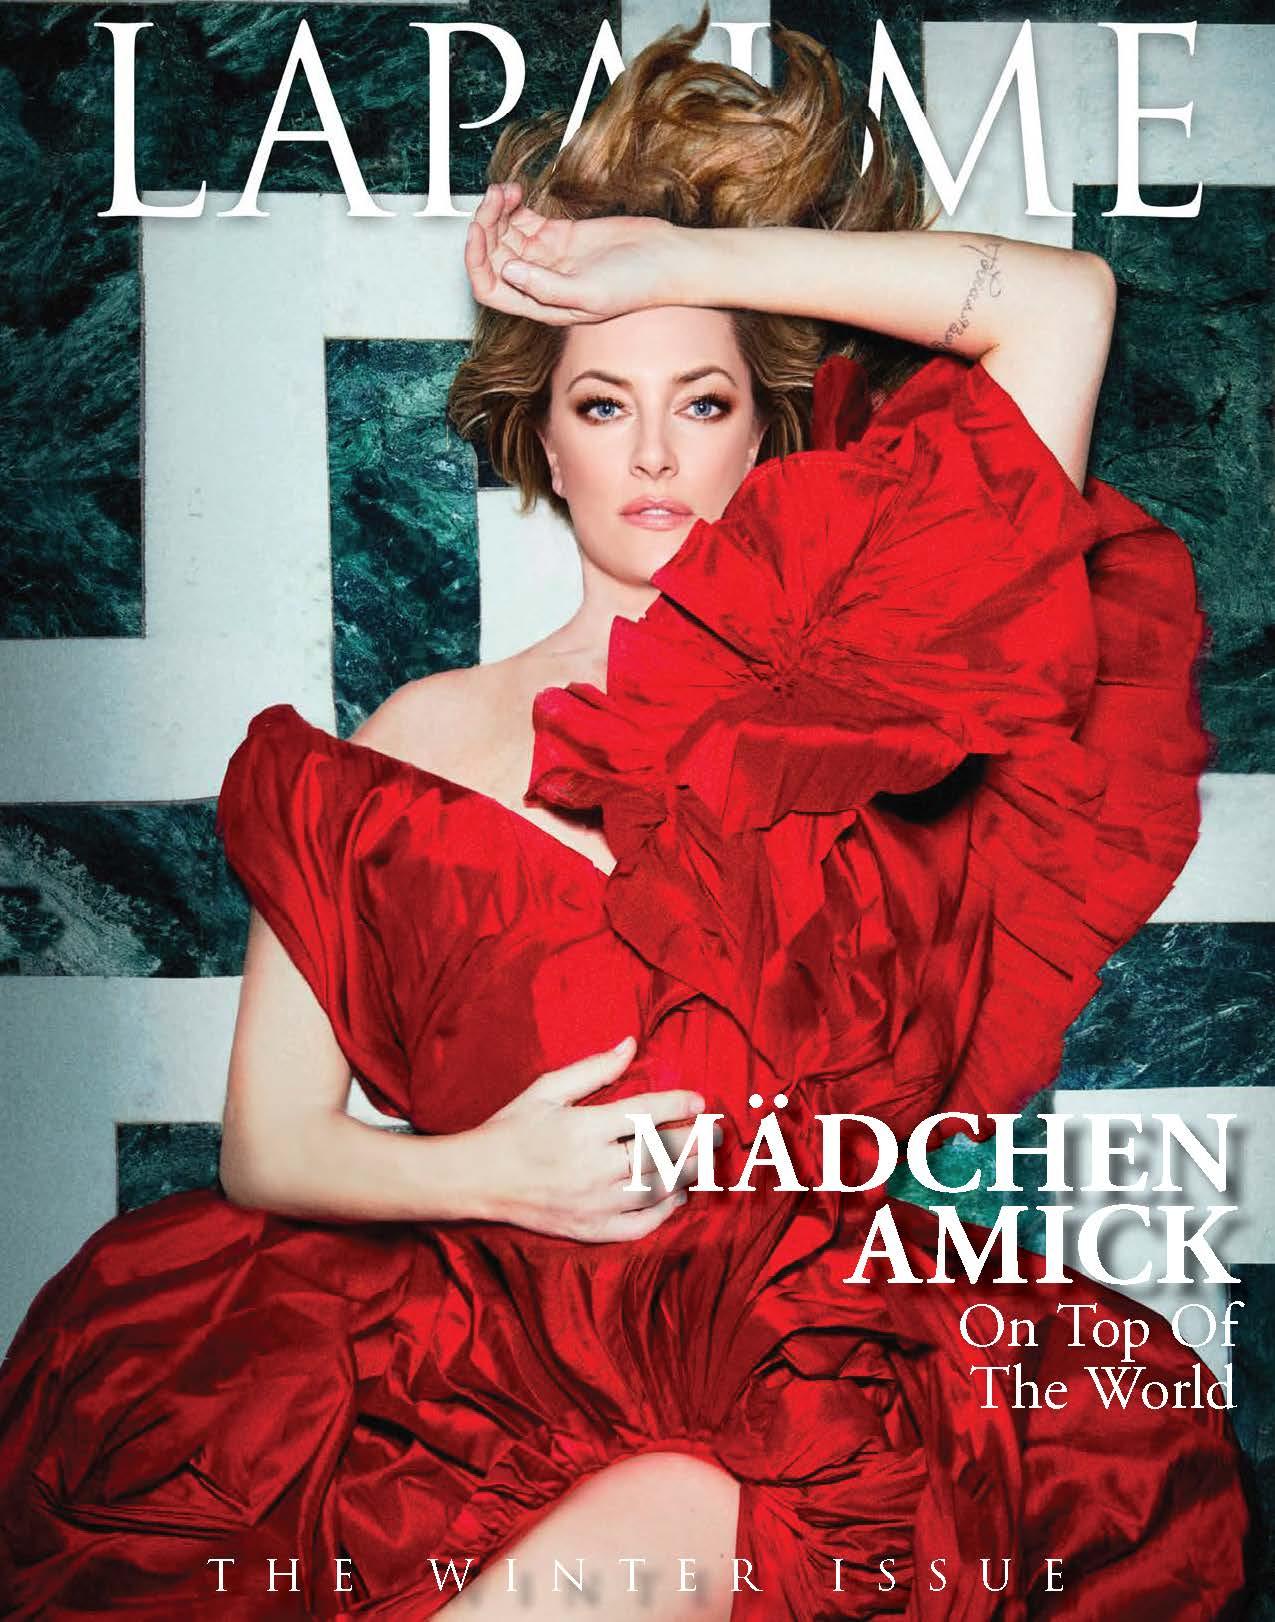 MÄDCHEN AMICK GRACES THE WINTER COVER